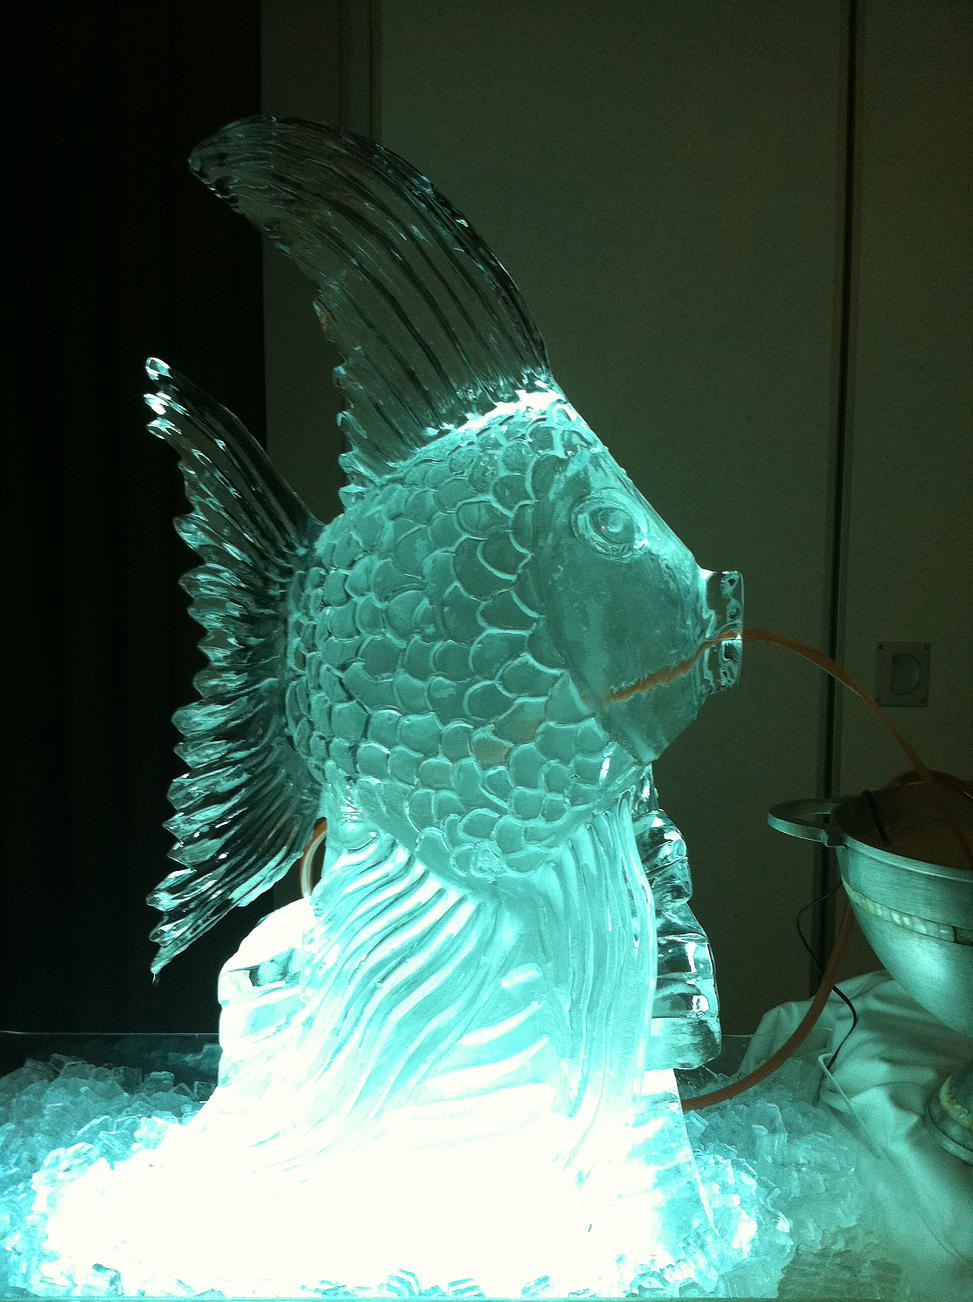 Angel fish ice sculpture